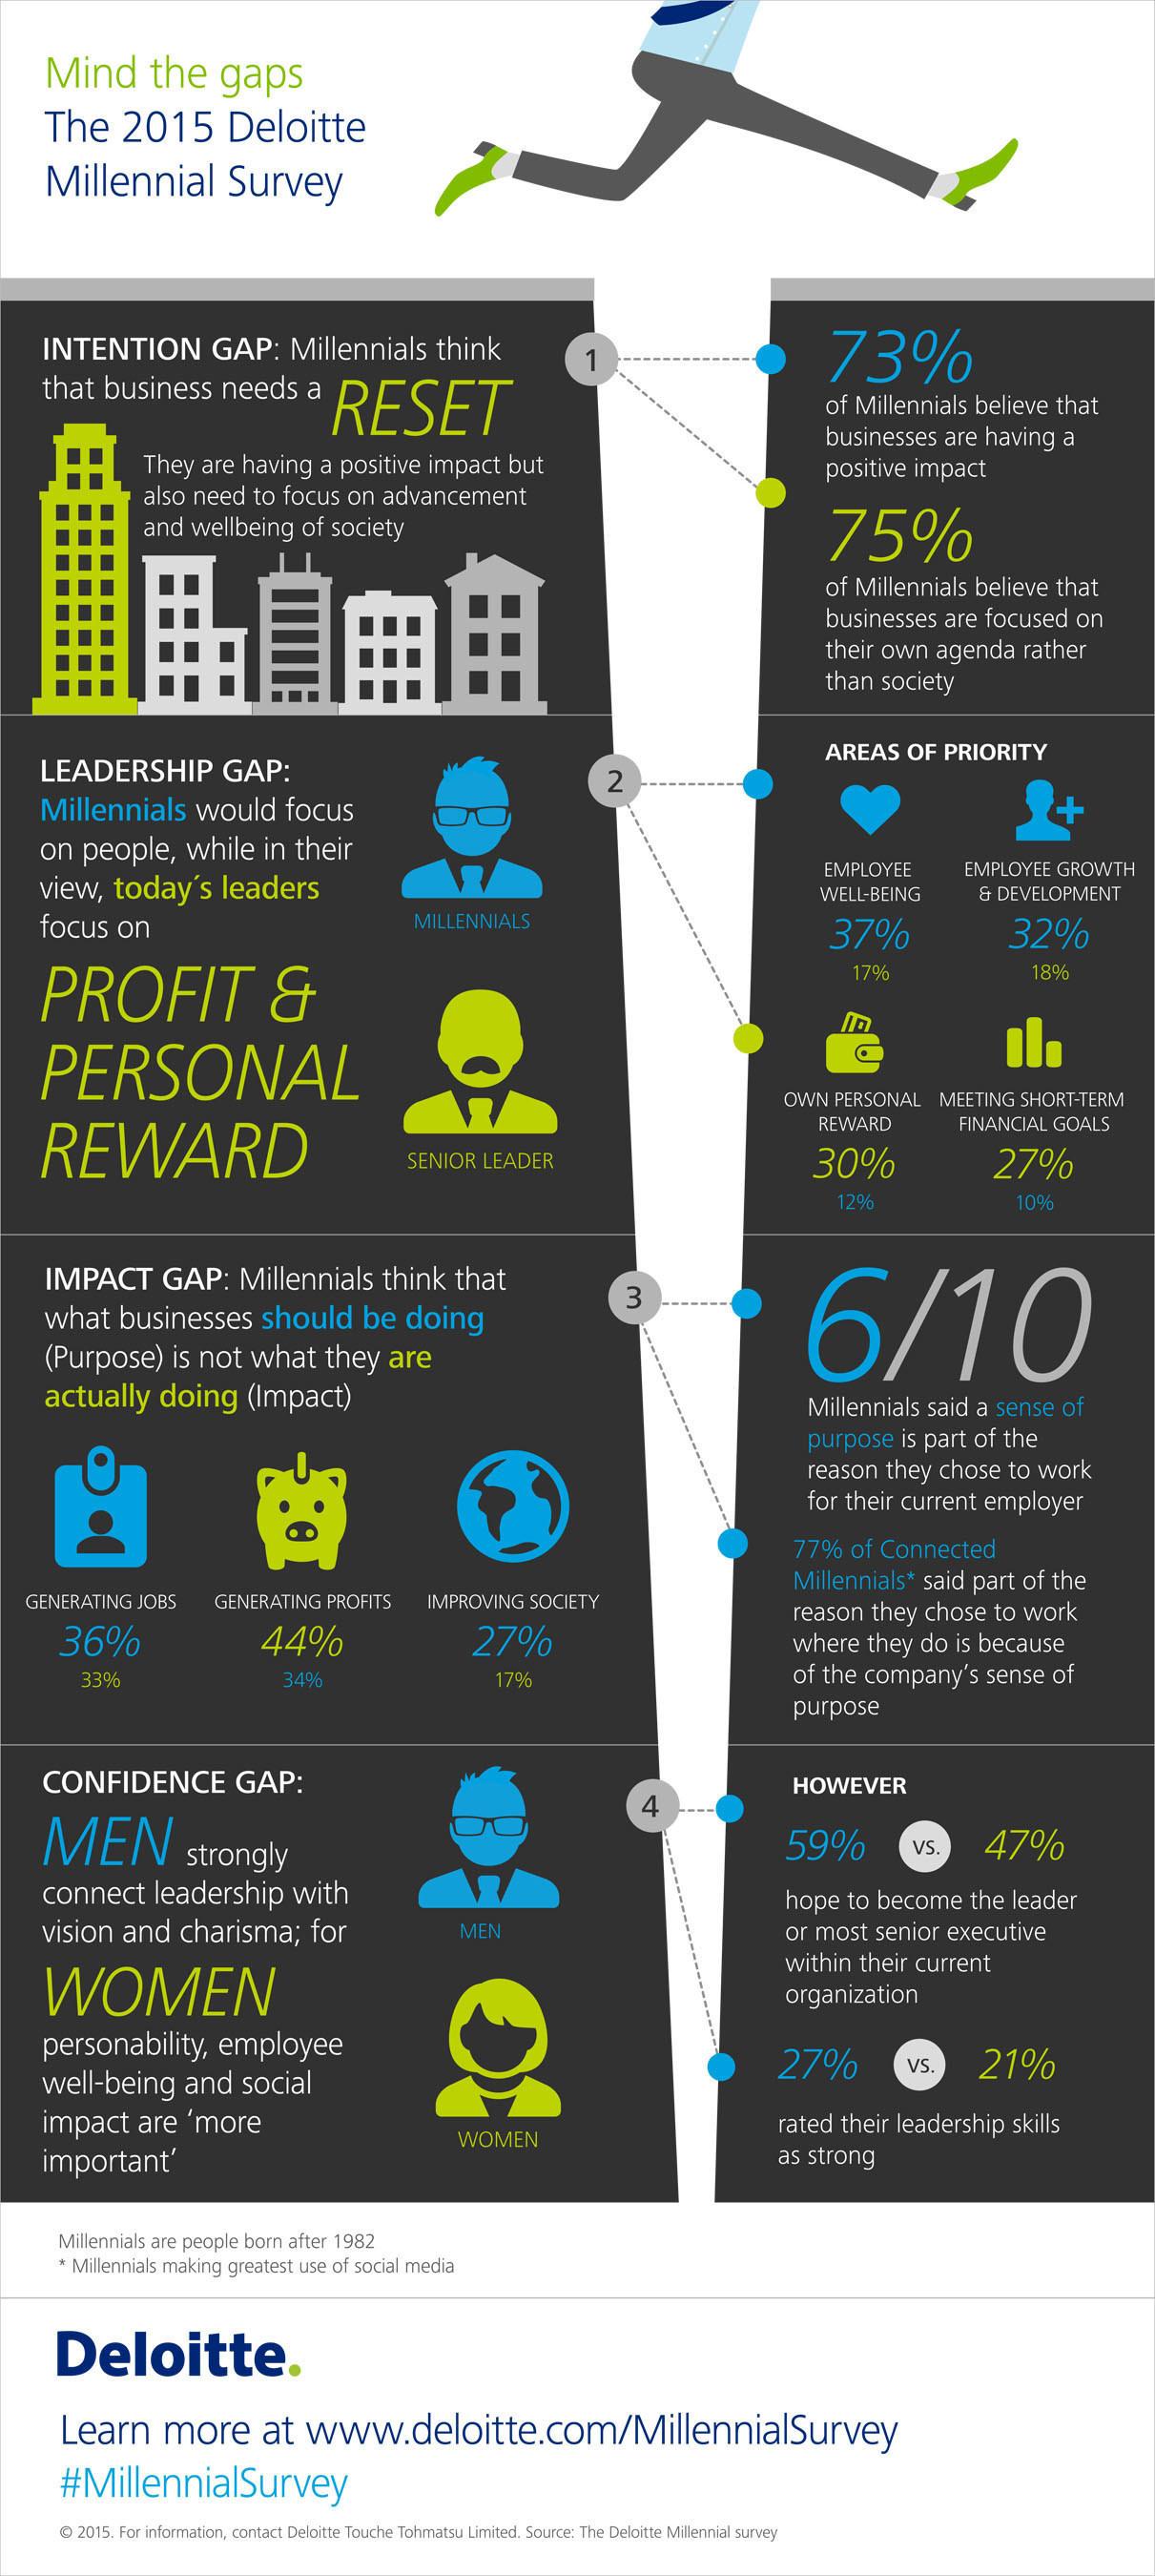 Mind the gaps: The 2015 Deloitte Millennial Survey